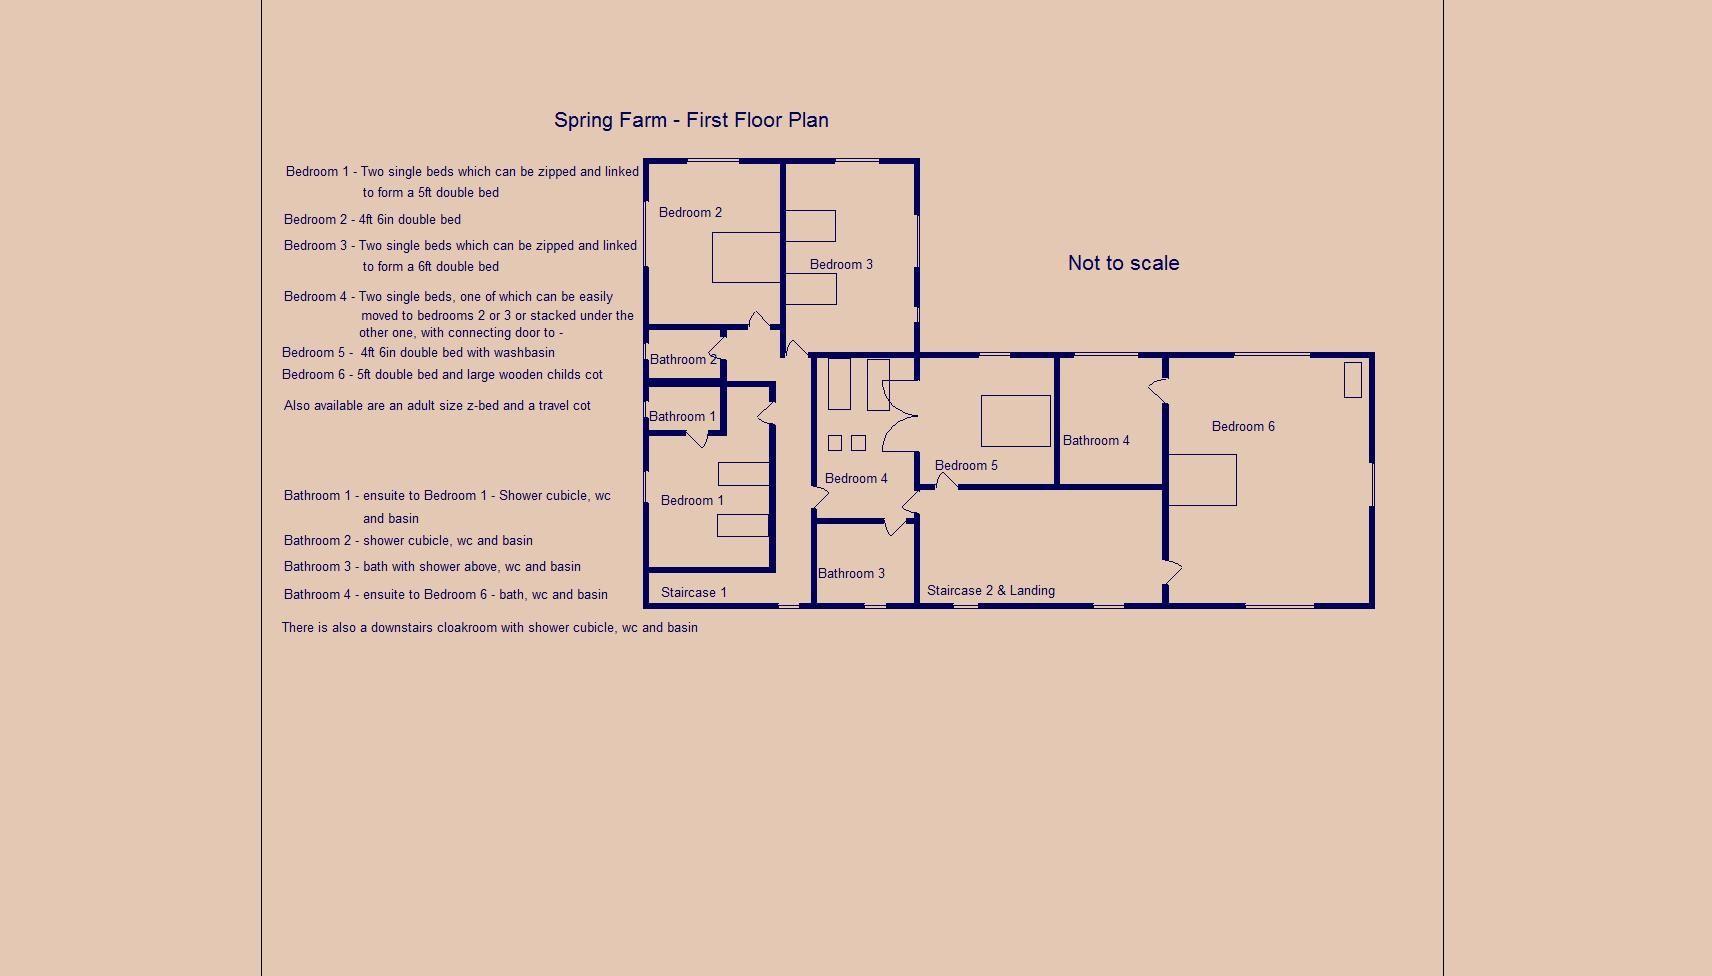 Spring Farm - first floor plan